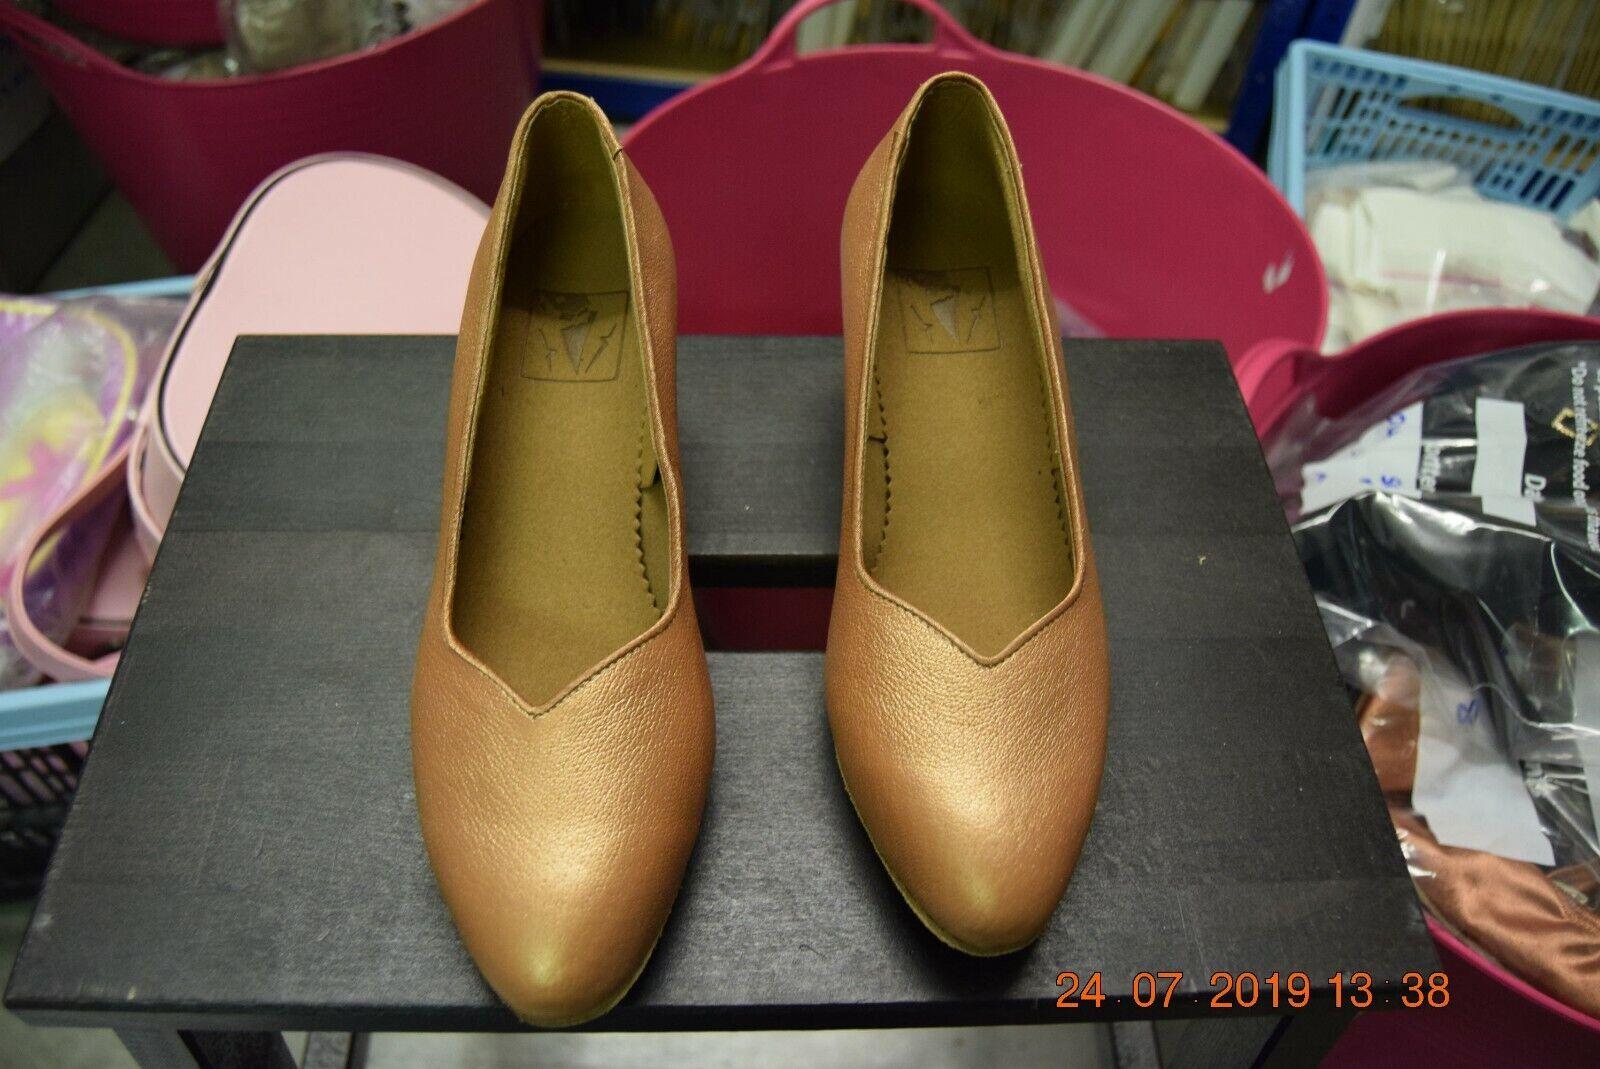 Tan satin leather Dancelife 4743 ballroom / latin dance shoes - size UK 3